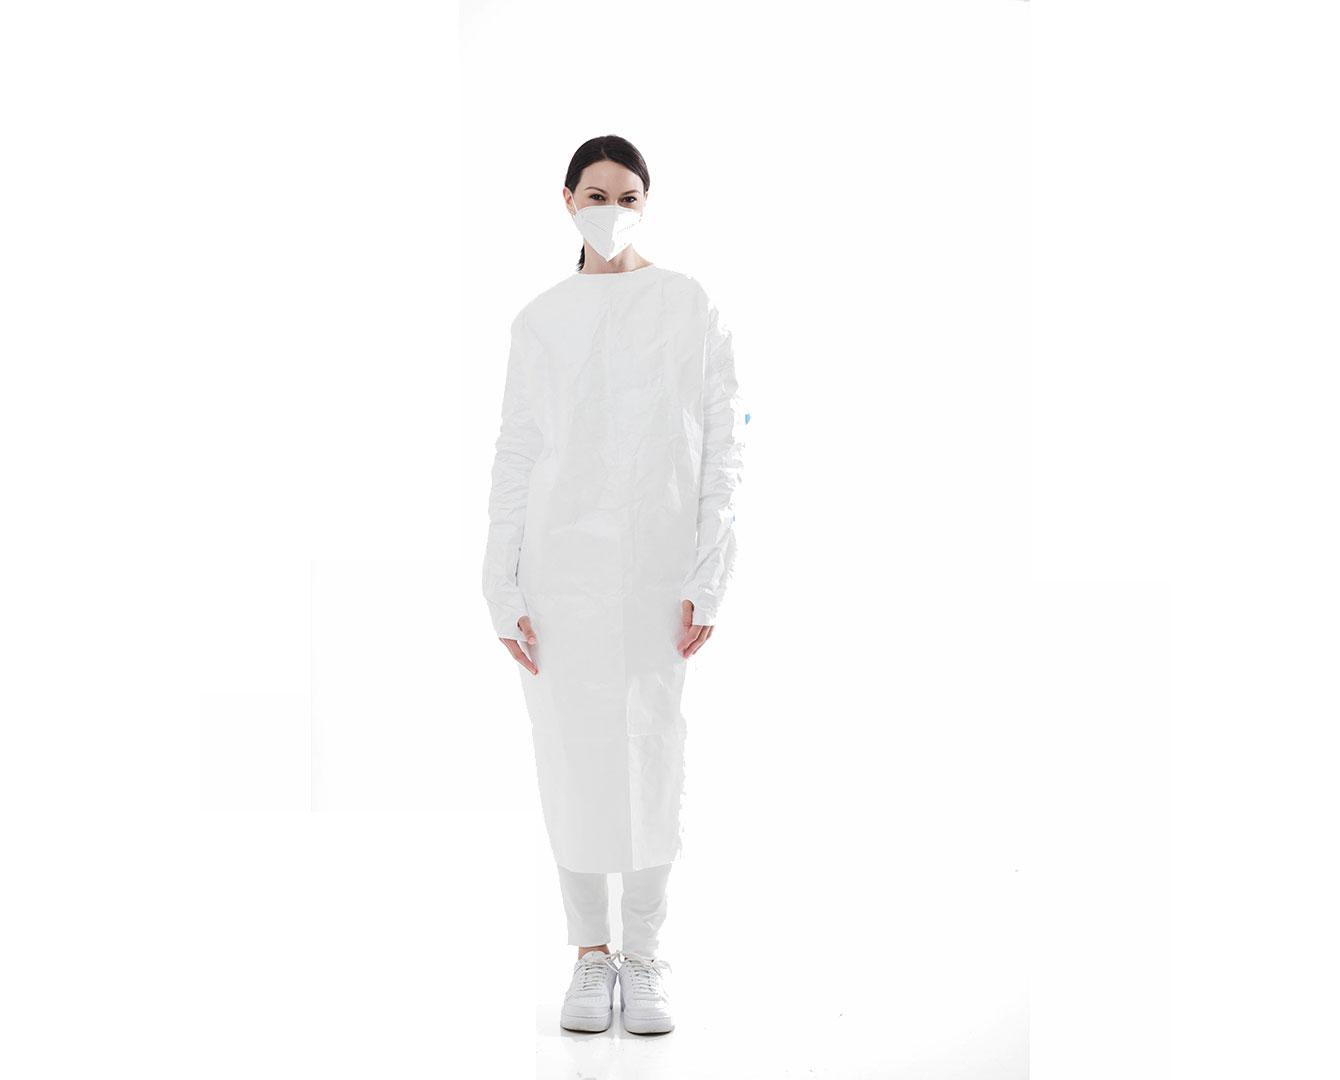 Tyvek Isolation Gown